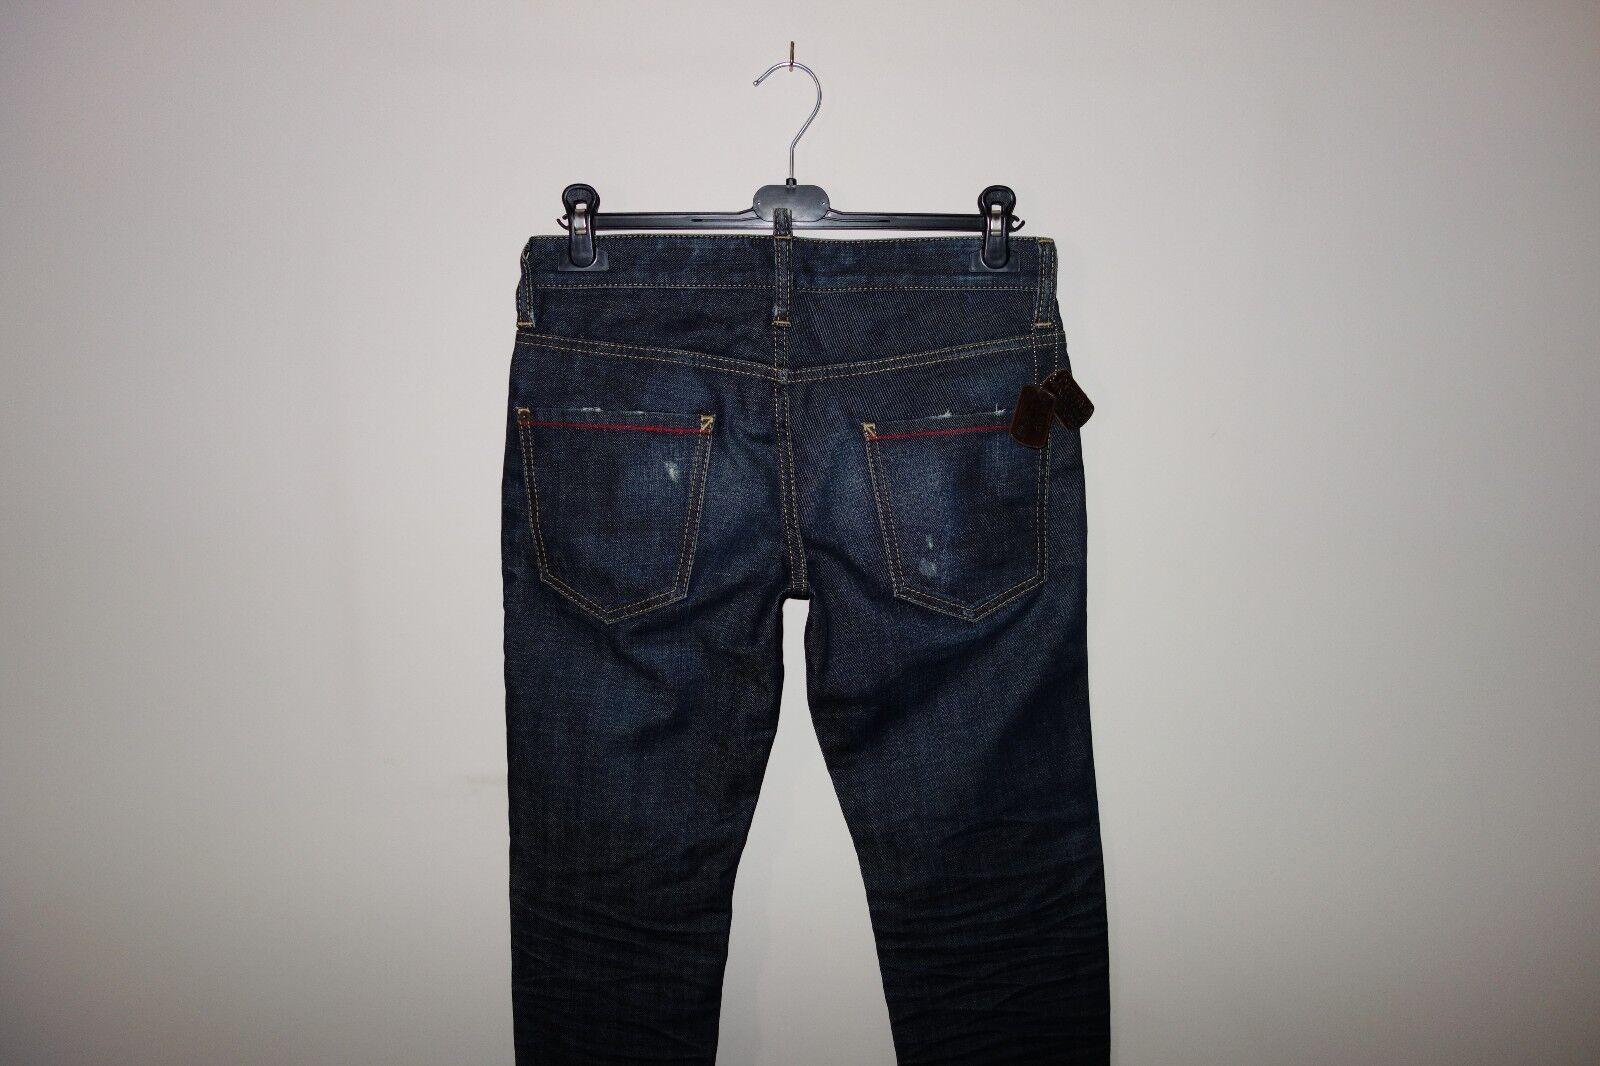 Dsquared² Runway AMERICAN GIGOLO Jeans 44 IT SS 11 S74LA0335 Made in , RARE